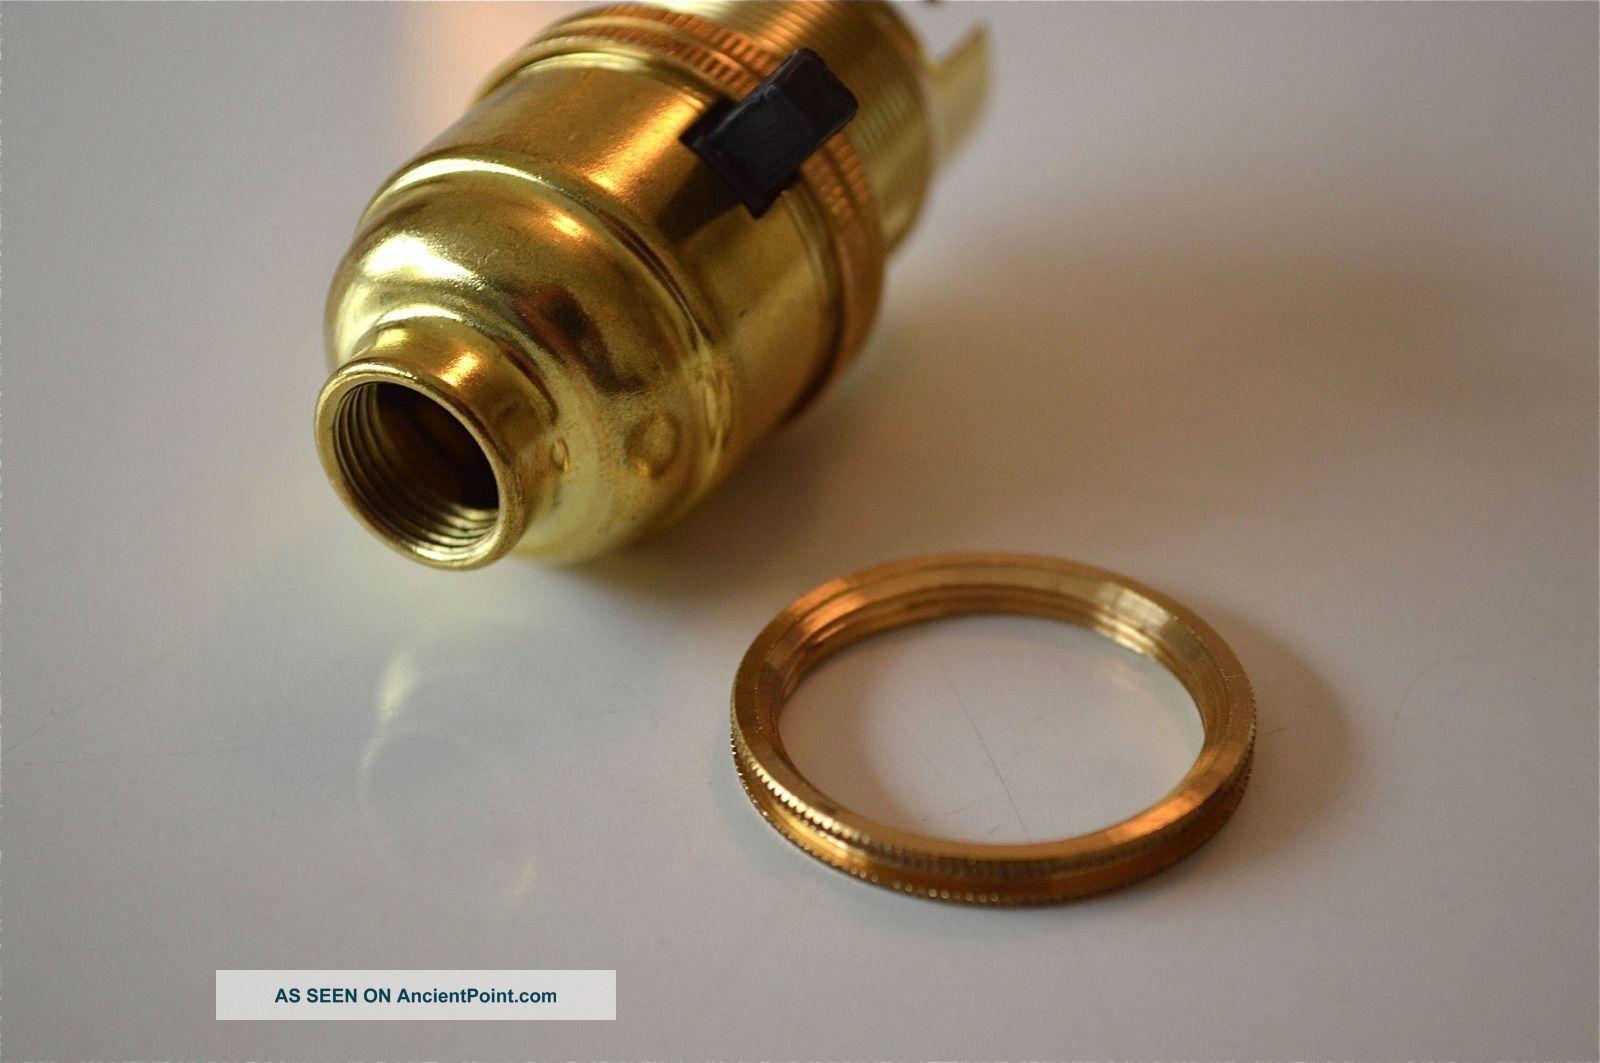 SWITCH BRASS BAYONET FITTING LAMP BULB HOLDER LAMP HOLDER C//W SHADE RING 10MM L9